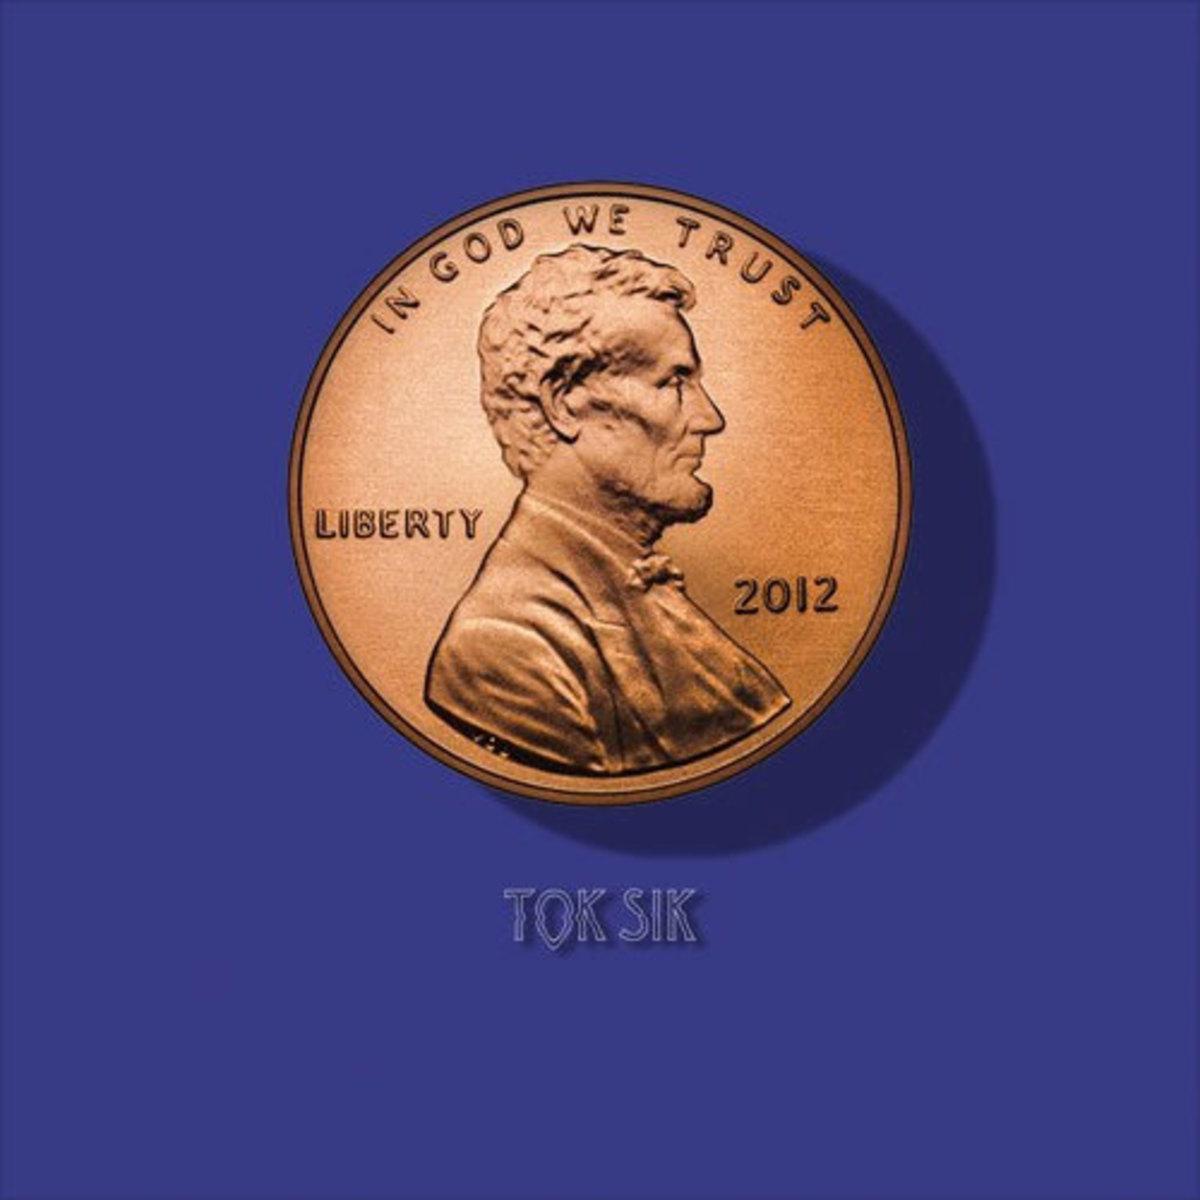 tok-sik-penny-pinchin.jpg